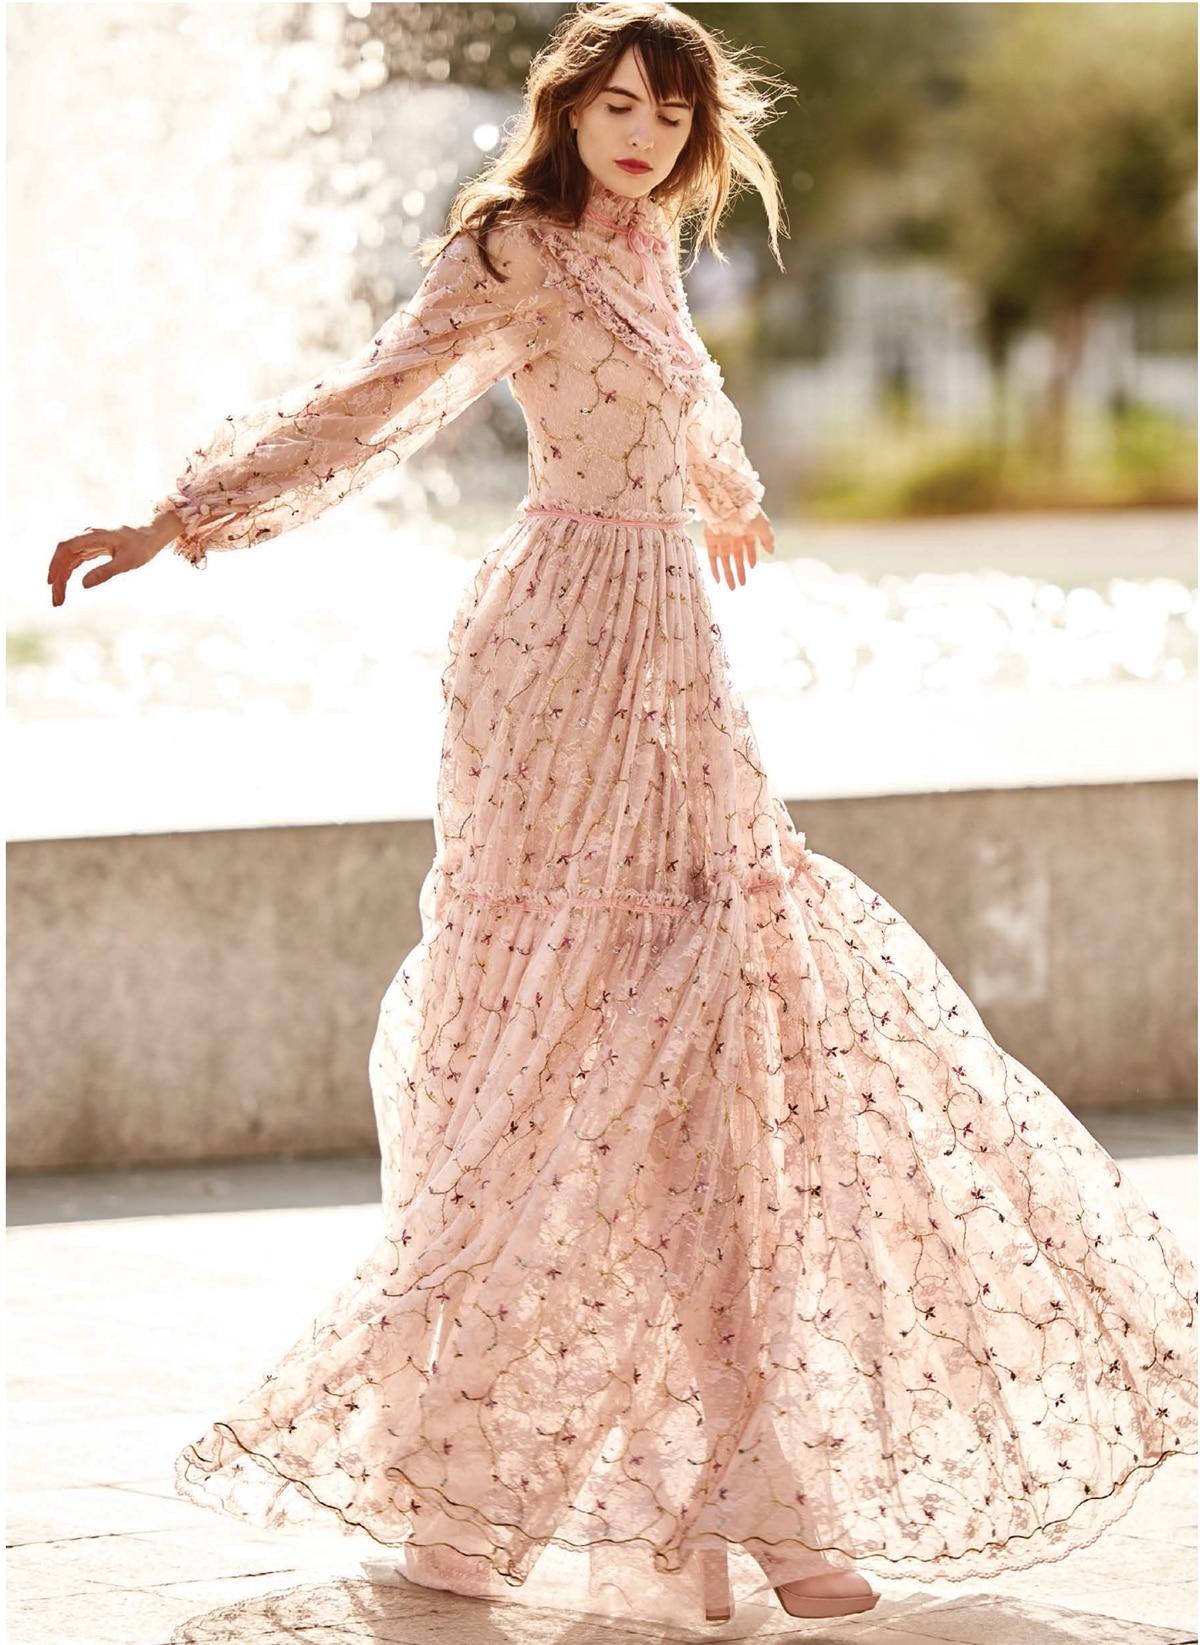 4725c353889 Boho peach long dress with high neckline and long sleeves Christos  Costarellos